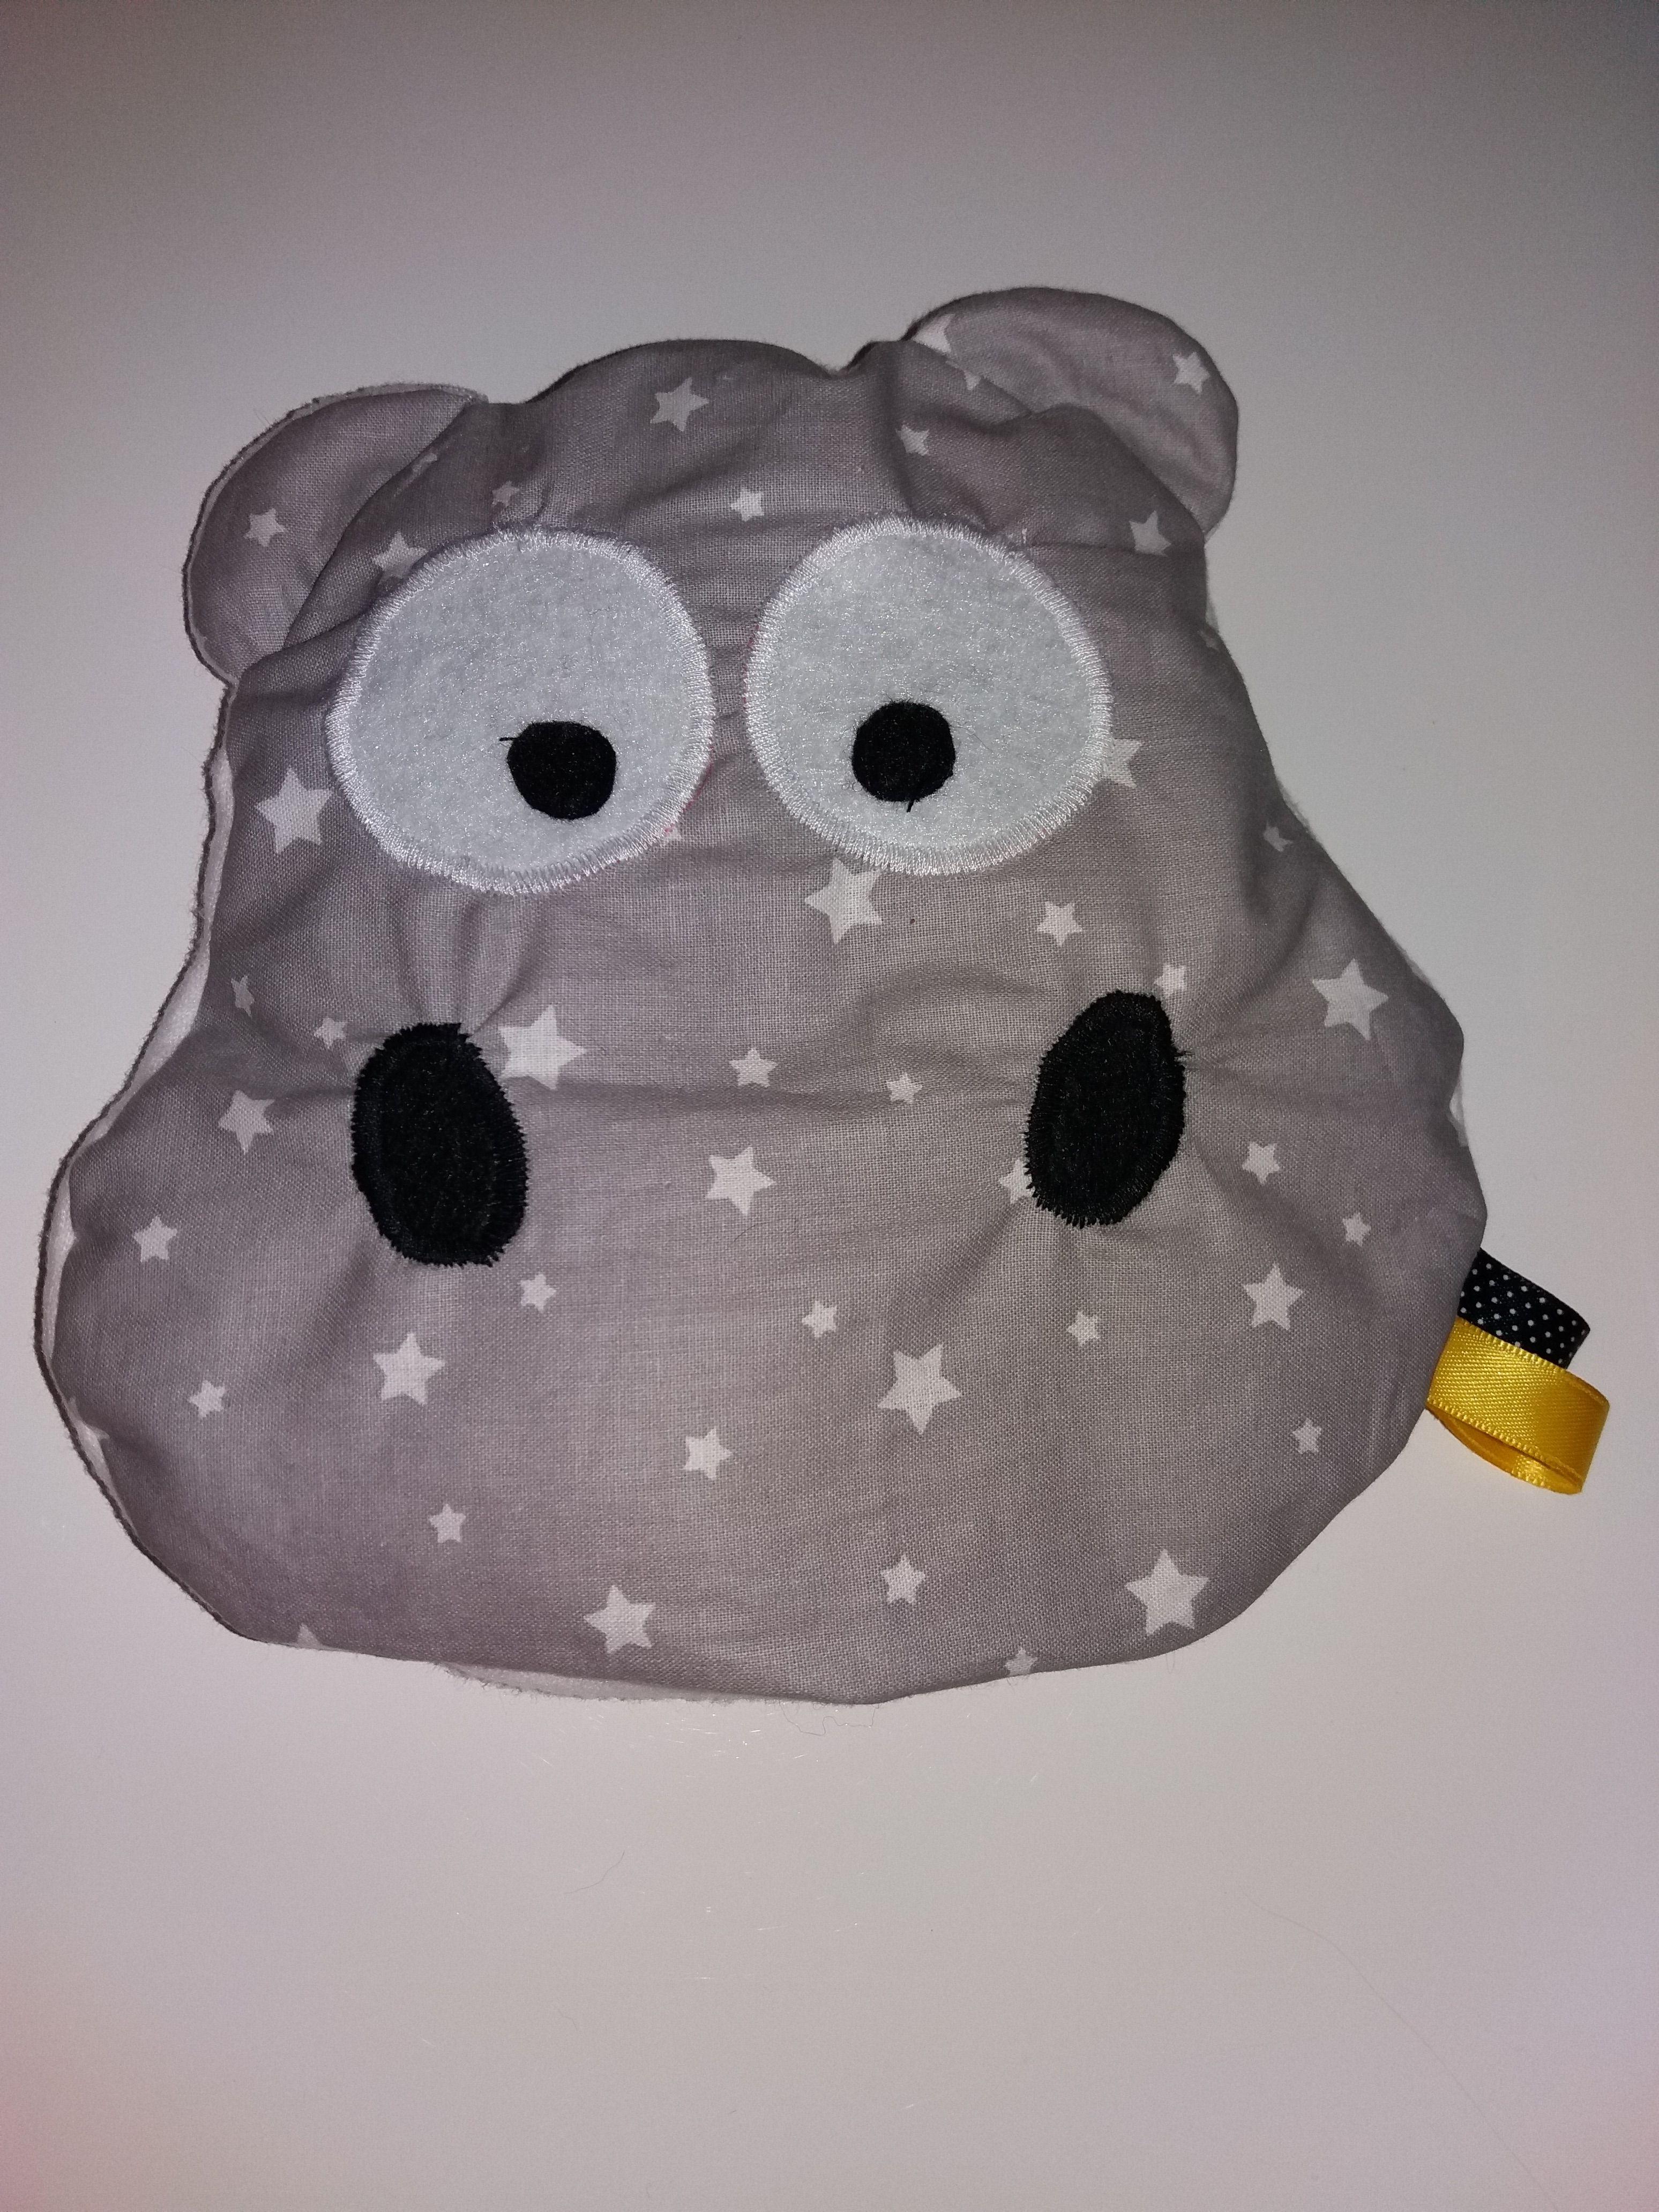 doudou hippopotame , patron pris sur image google